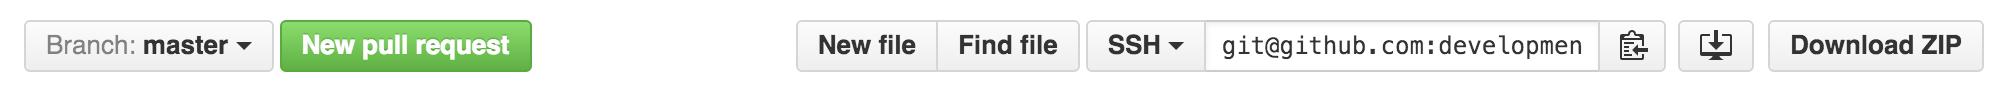 Github repository url